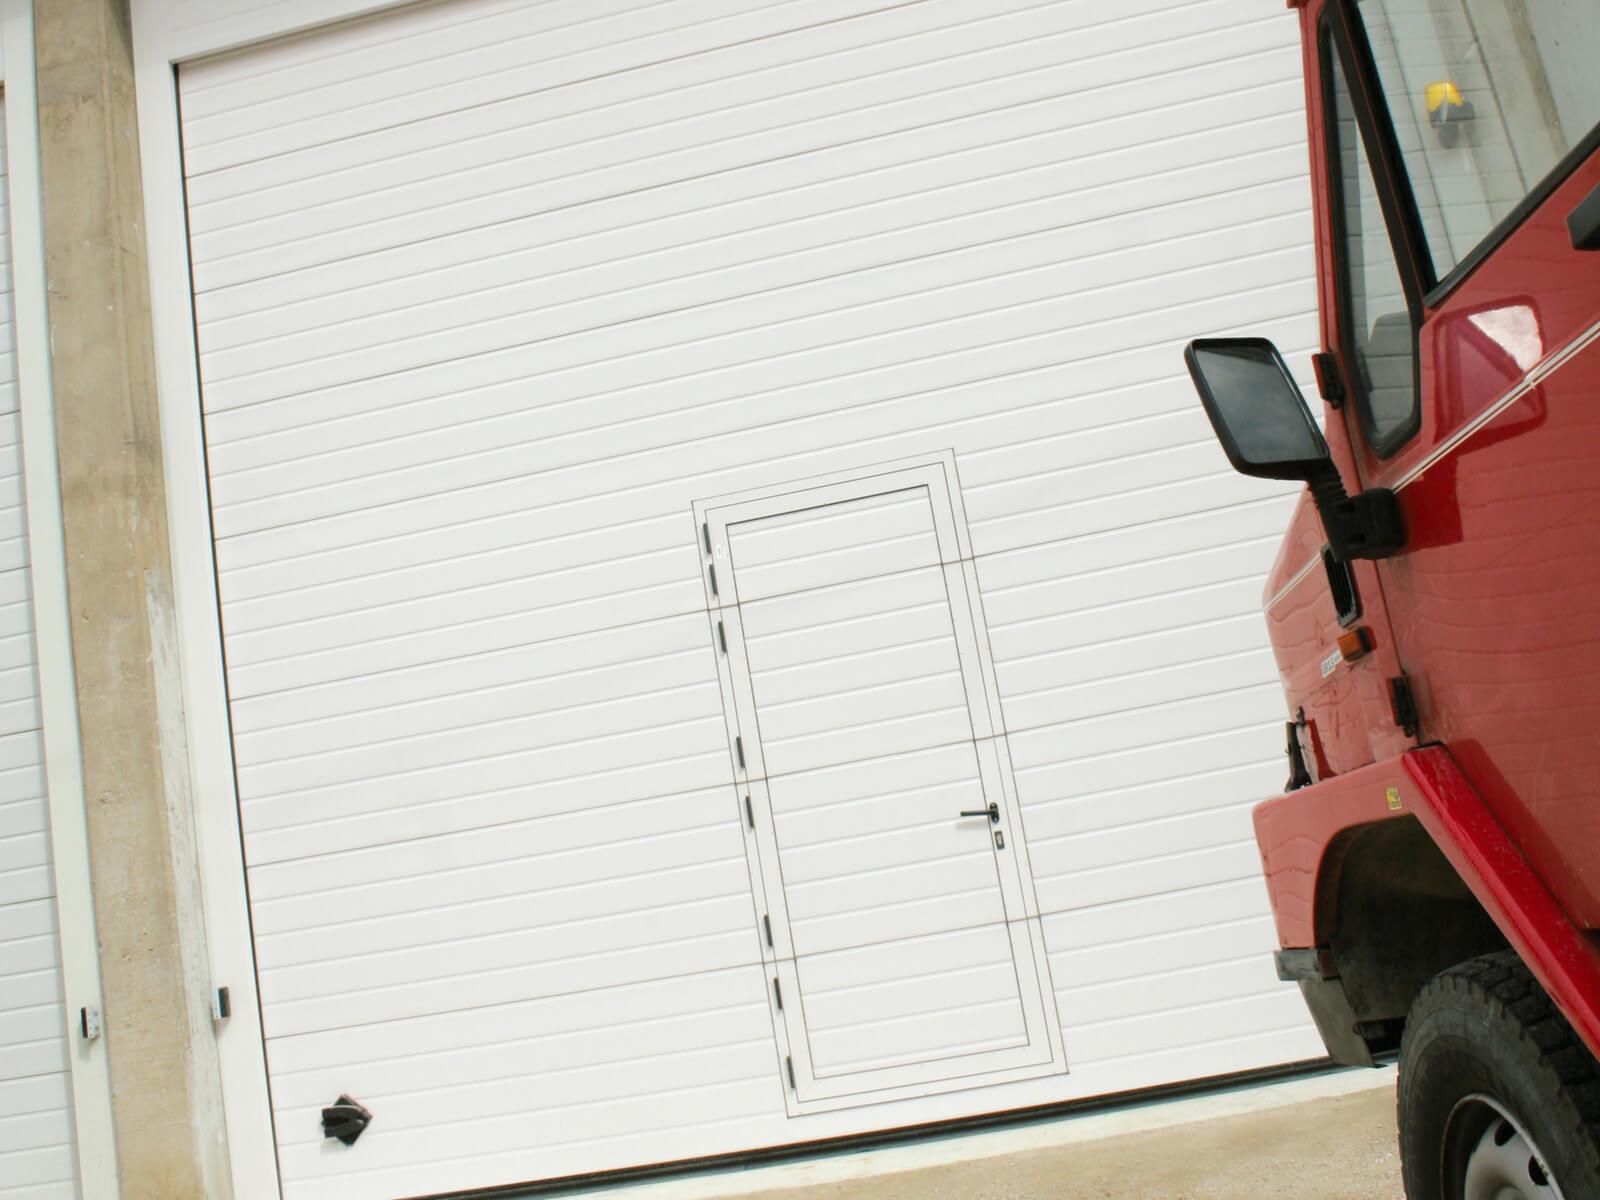 Portone sezionale industriale SECURA - Stucco bianco C21 porta pedonale